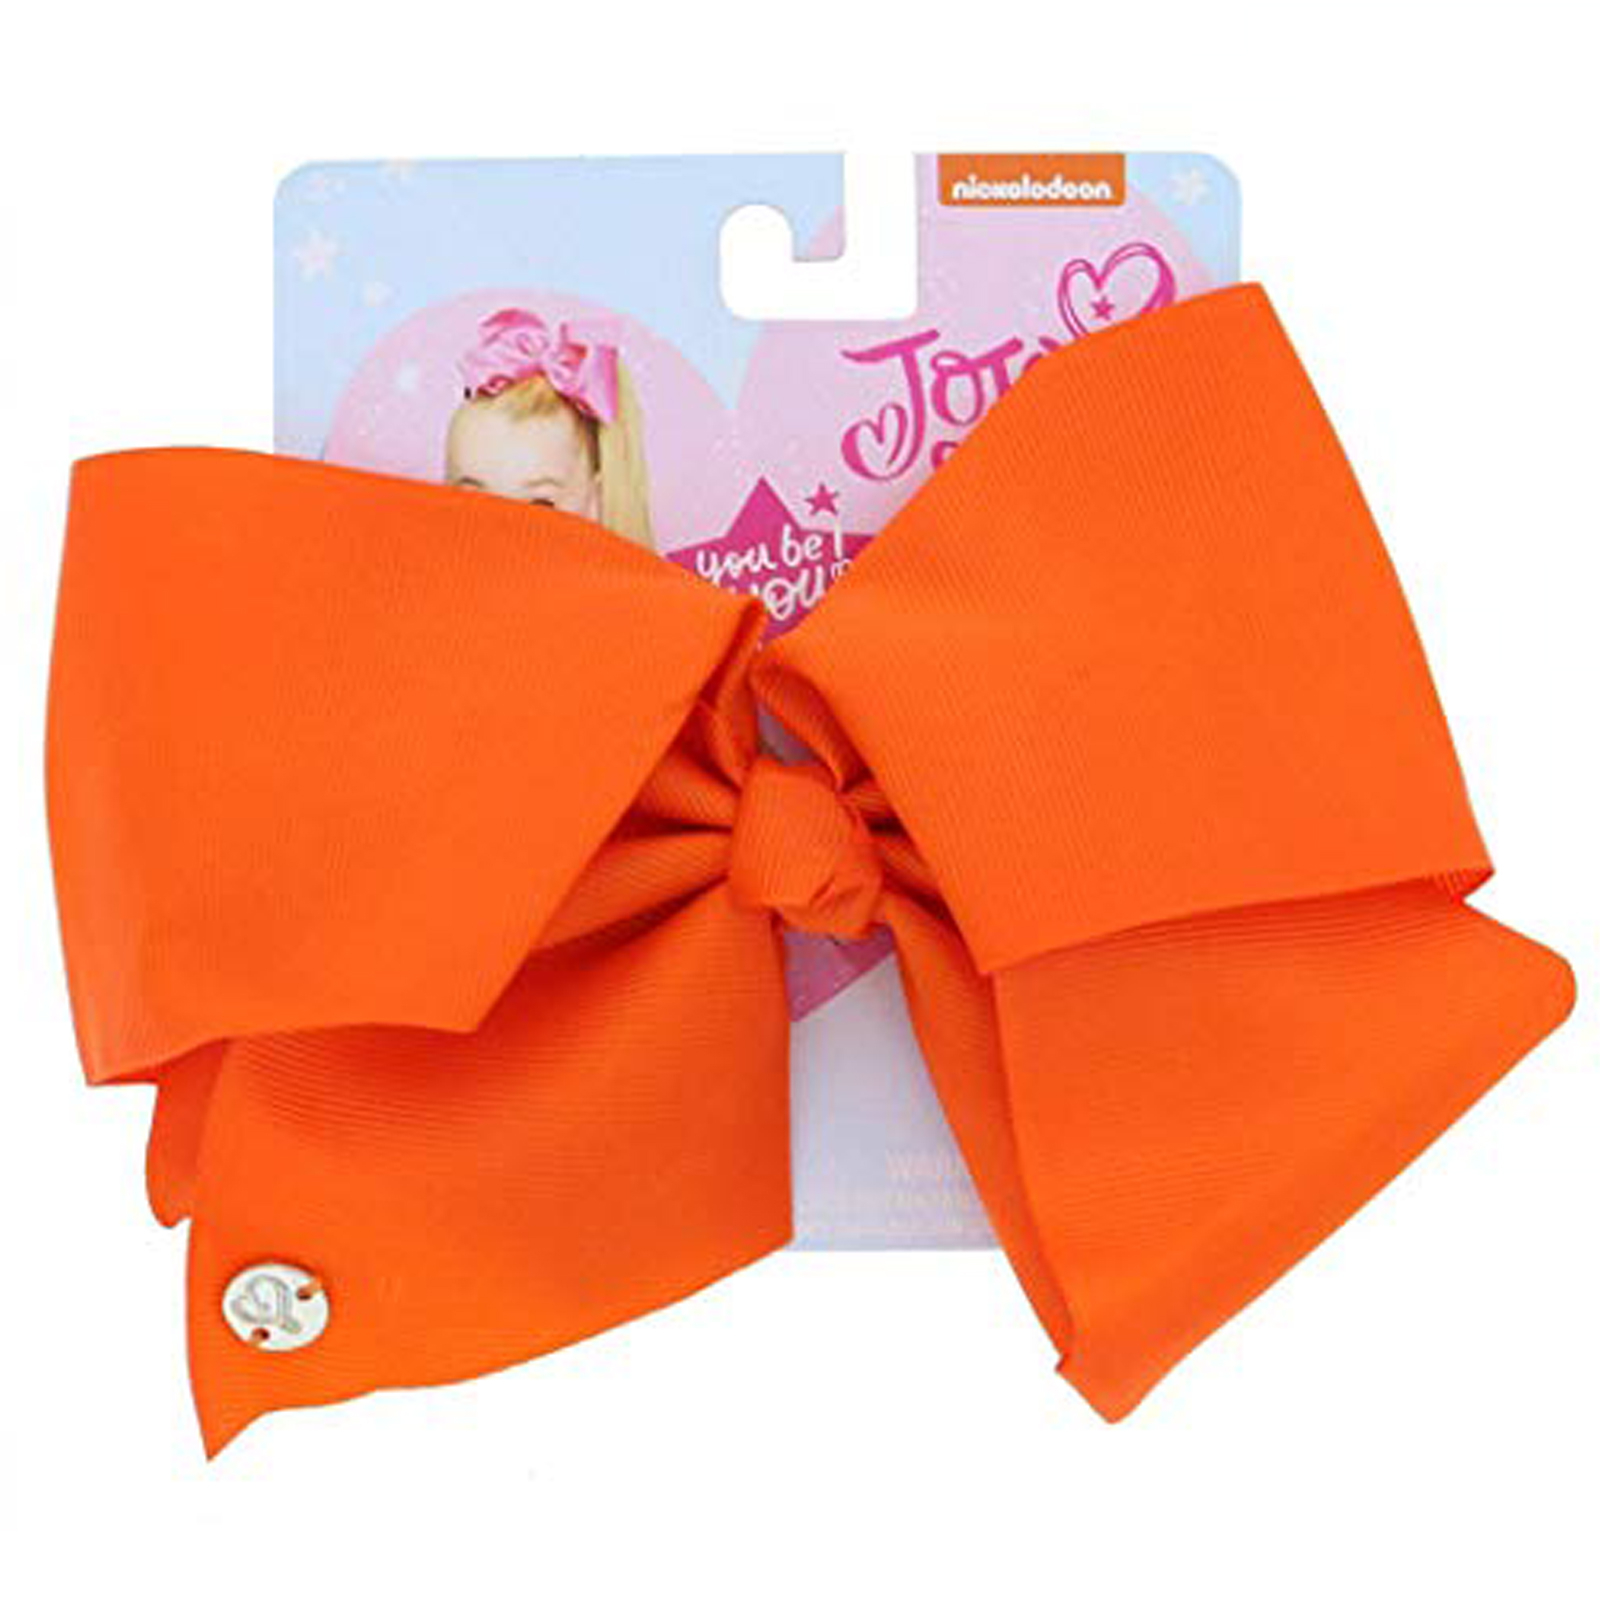 Nickelodeon JoJo Siwa Girls Large Hair Clip Style Bow Tangerine Hair Accessory